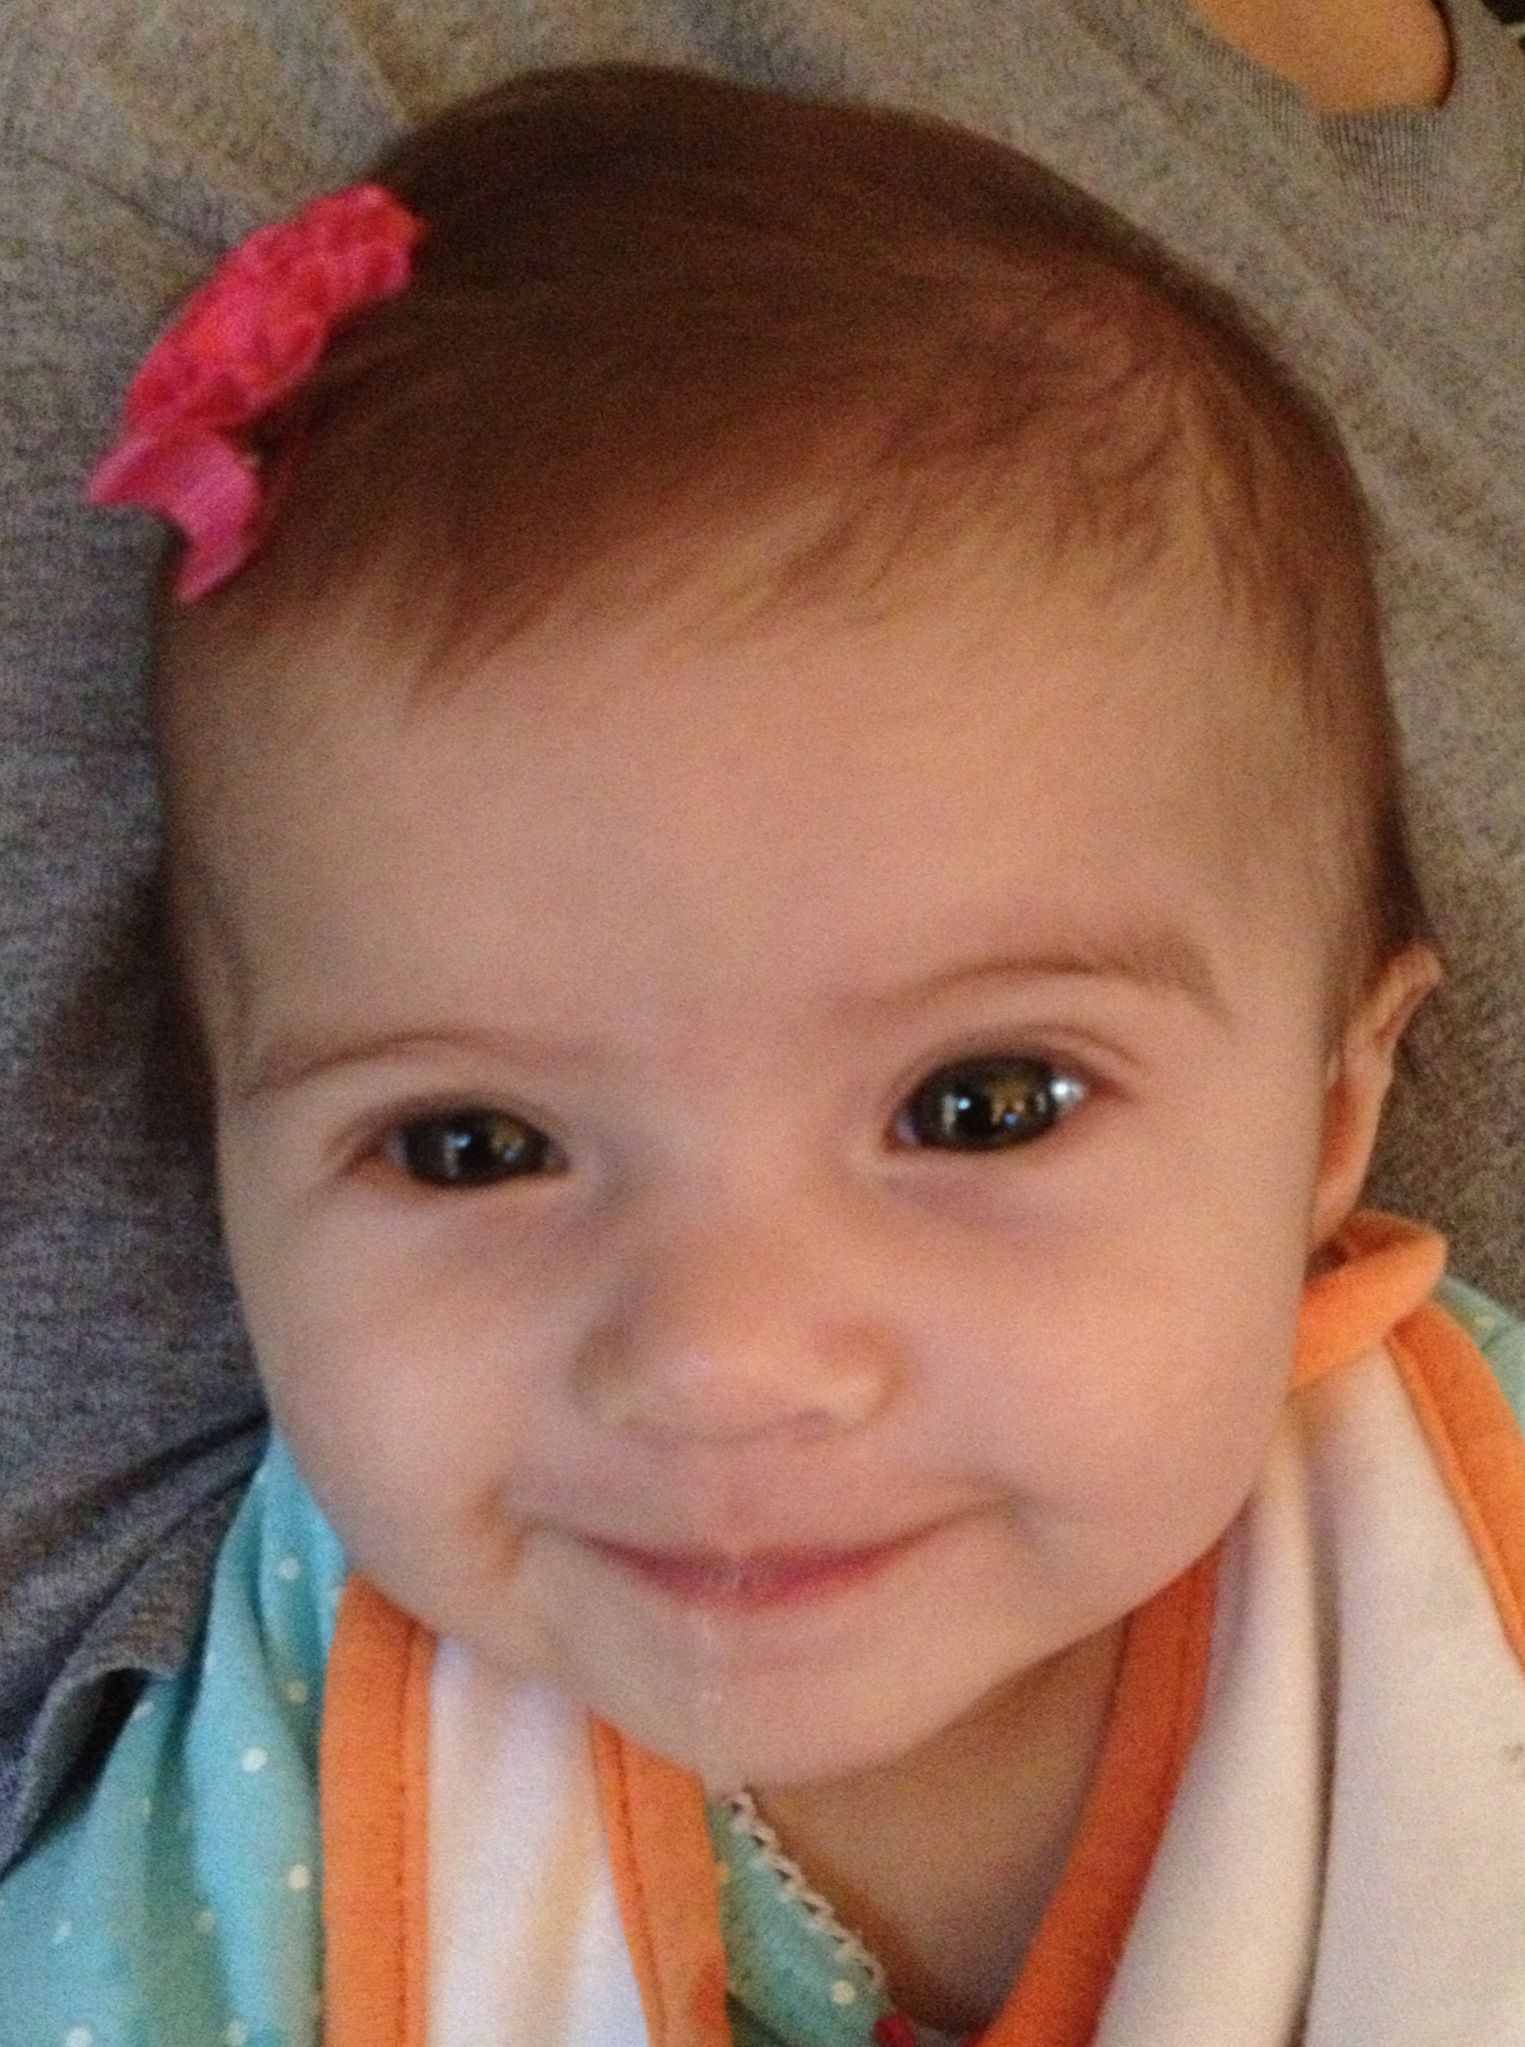 Alejandra 33 Months Ago